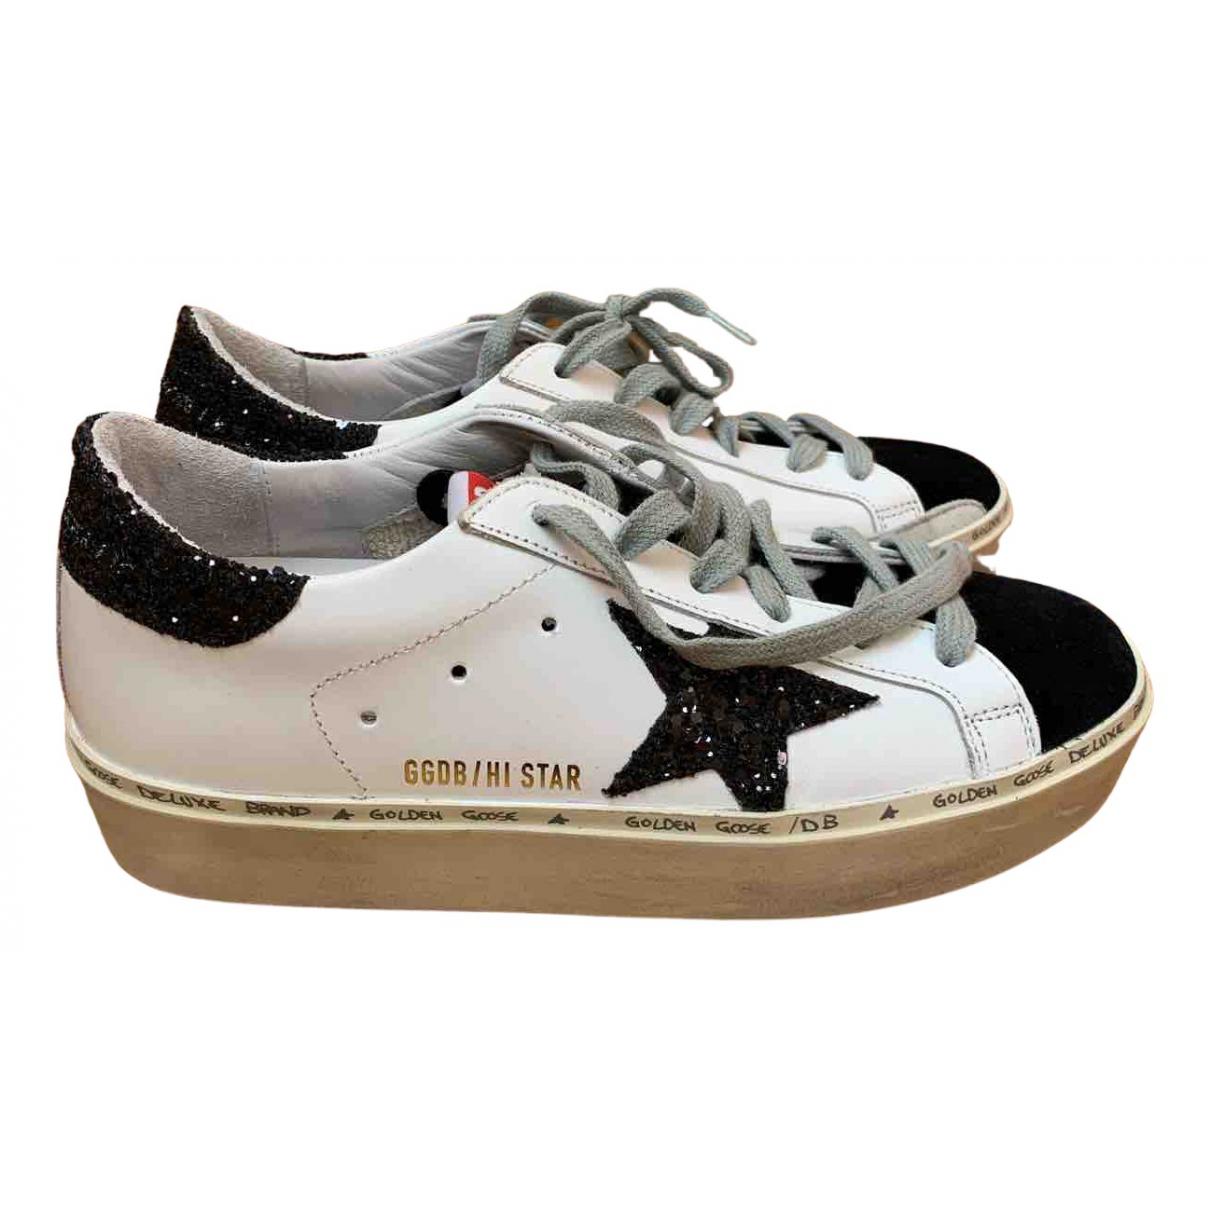 Golden Goose - Baskets Hi Star pour femme en cuir - blanc